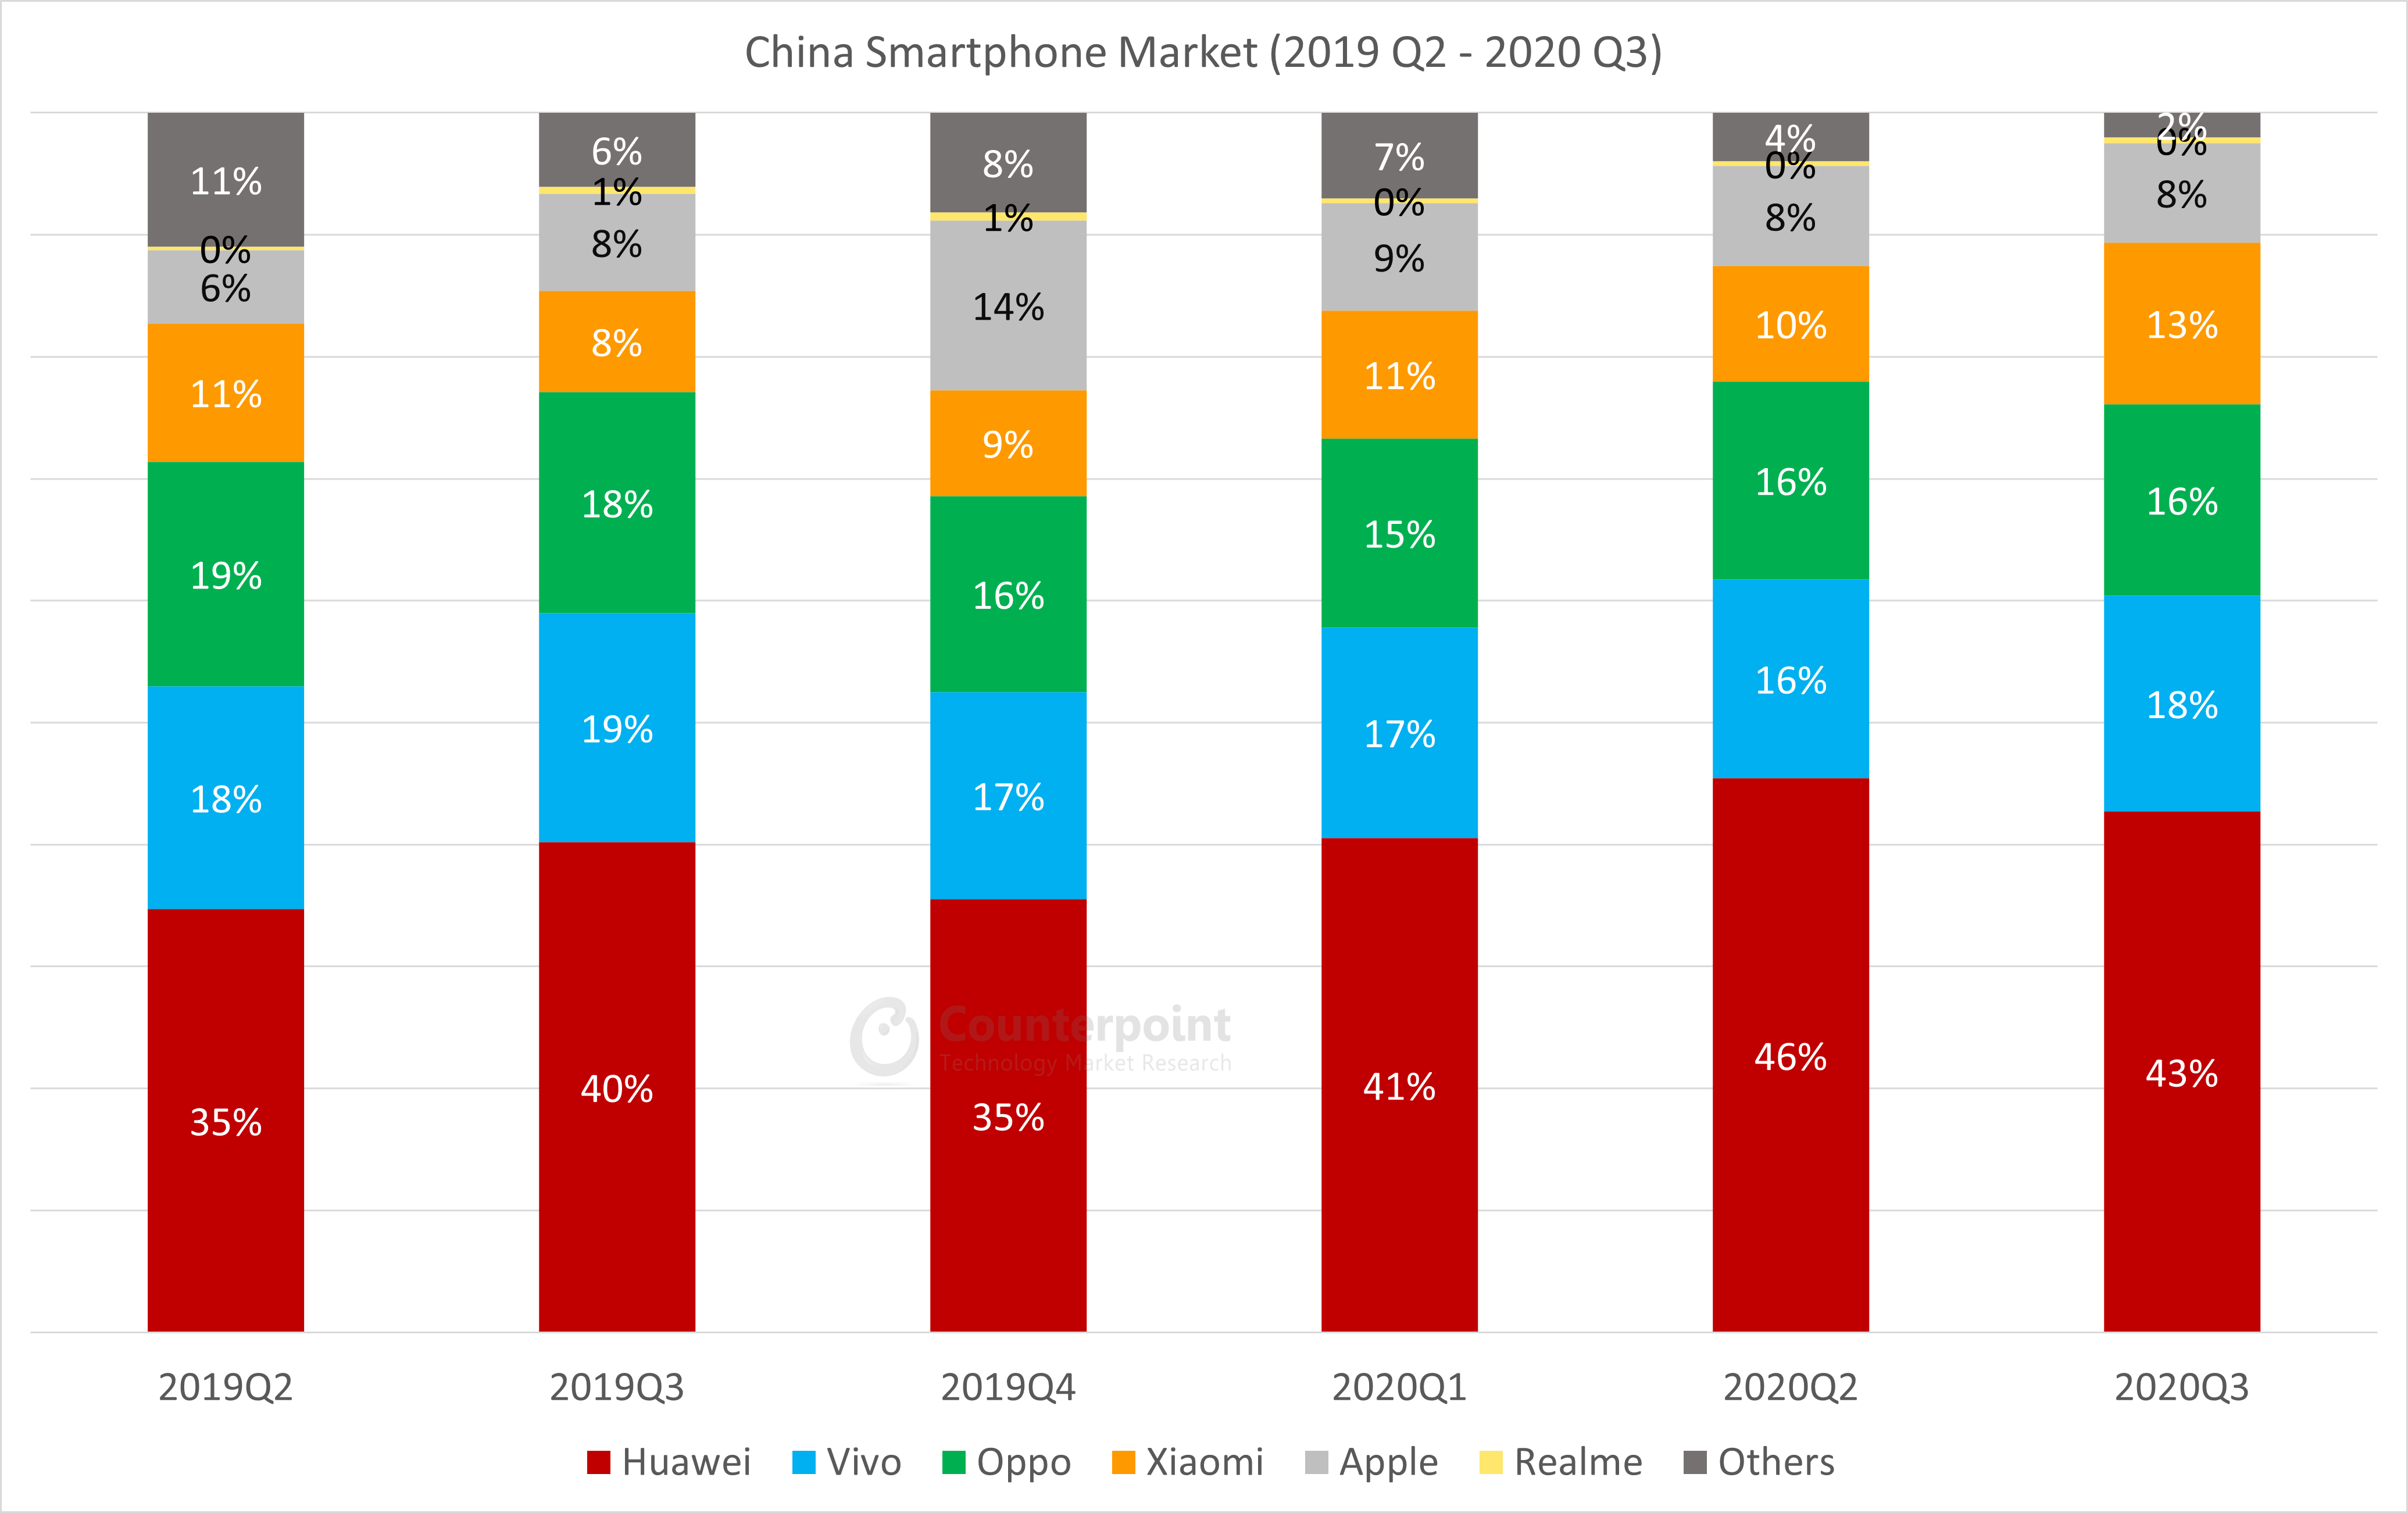 China-Smartphone Market Share